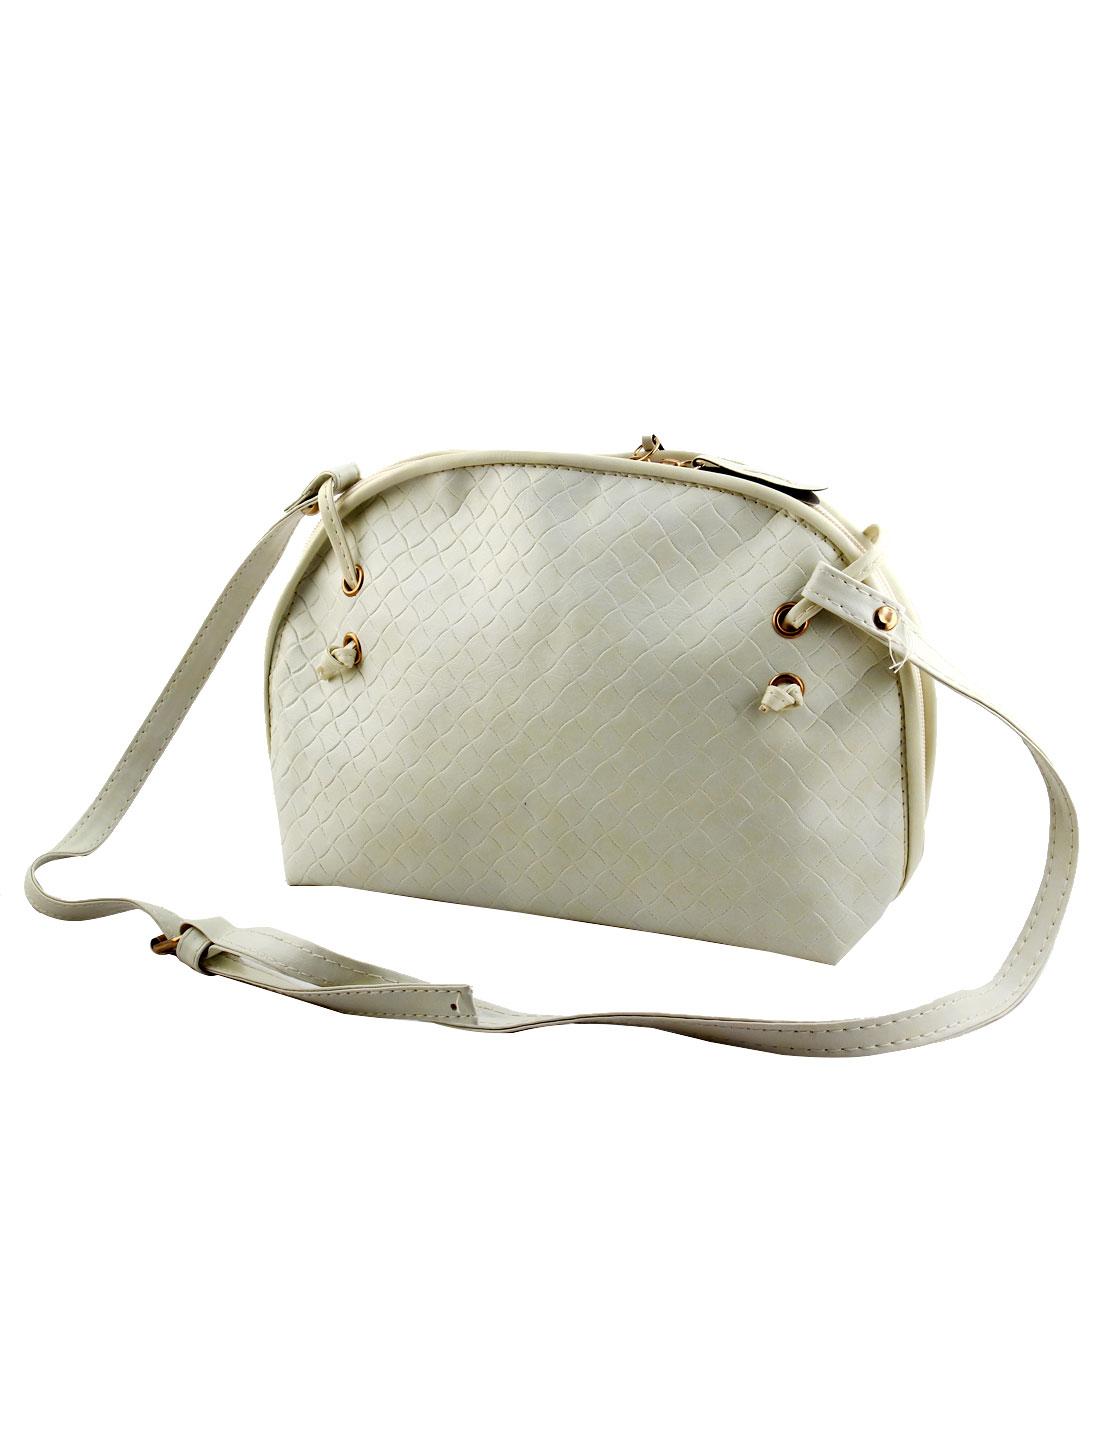 Women PU Tote Satchel Messenger Bag Casual Purse Cross Body Shoulder Handbag Beige